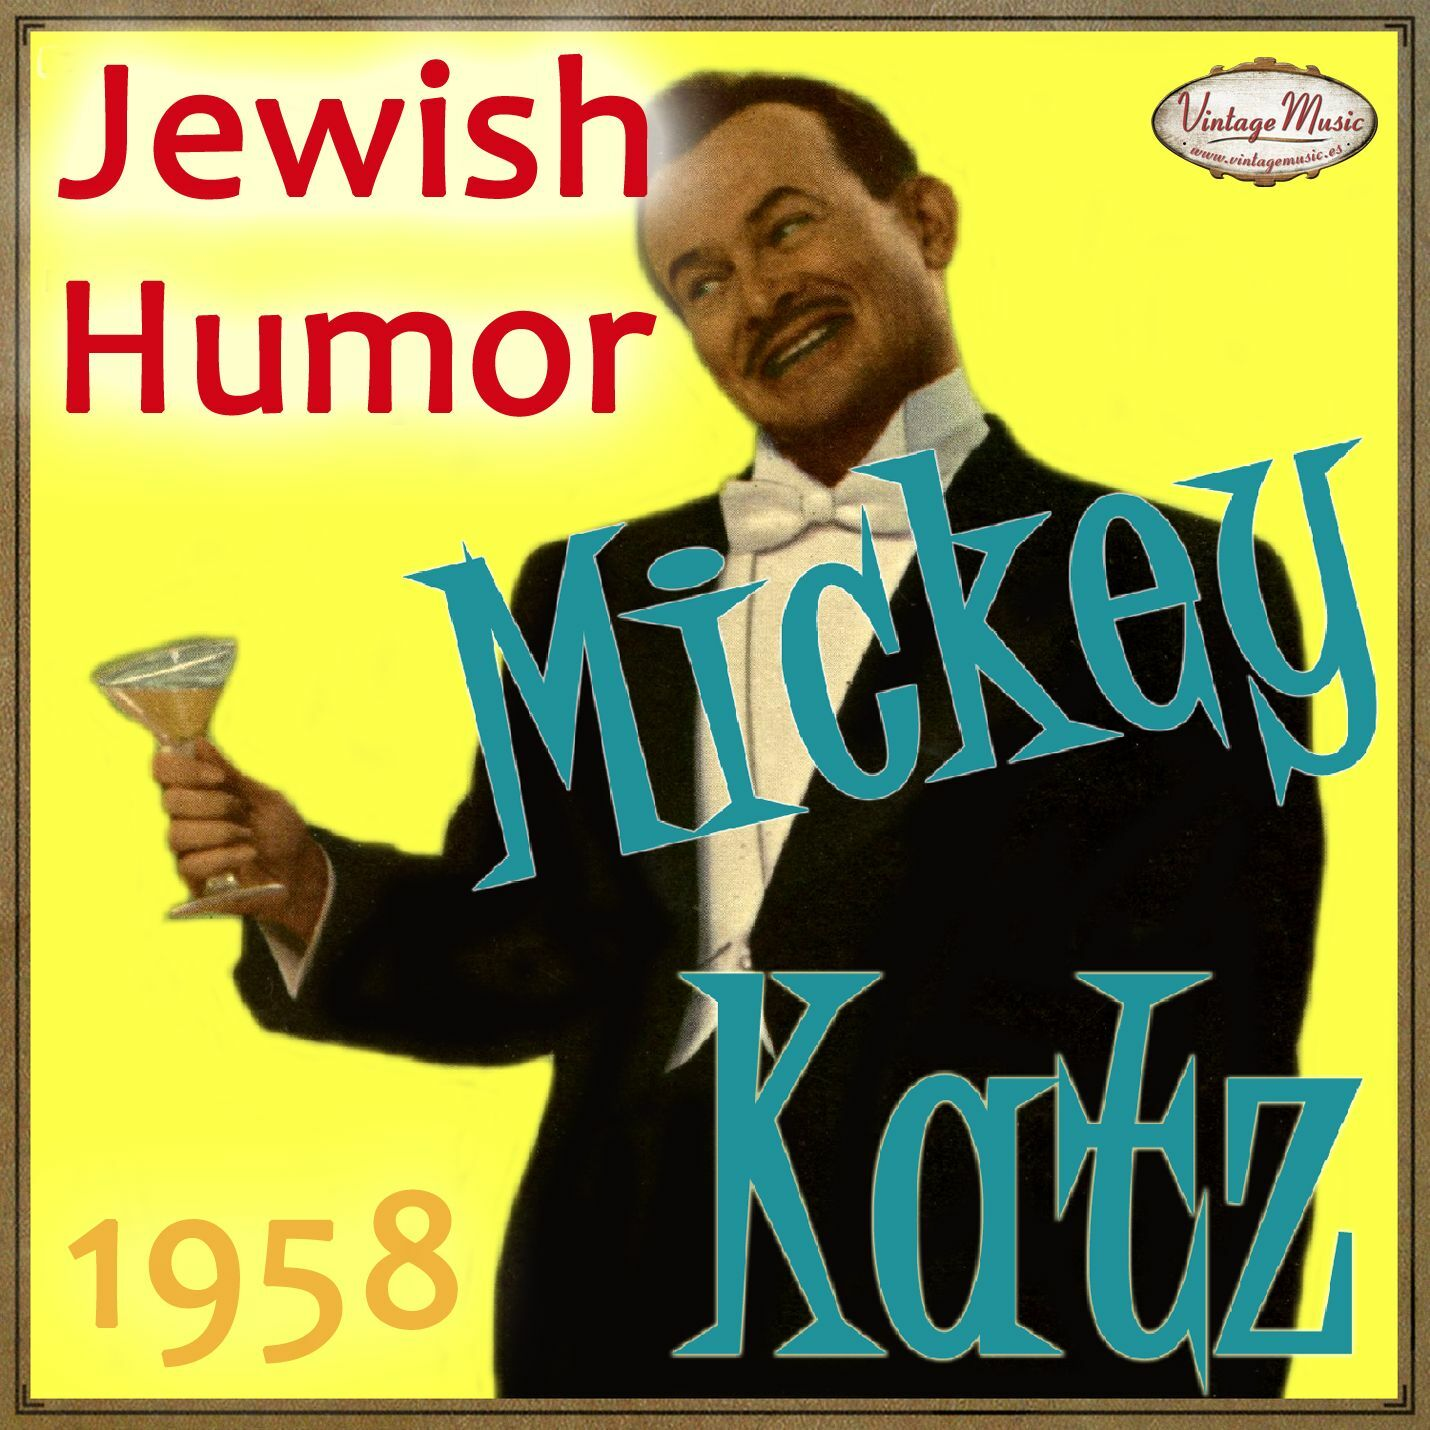 Mickey Katz - MICKEY KATZ CD Vintage Vocal Jazz. Jewish Humor , Hey Jealous Lover , Tico Tico - CD